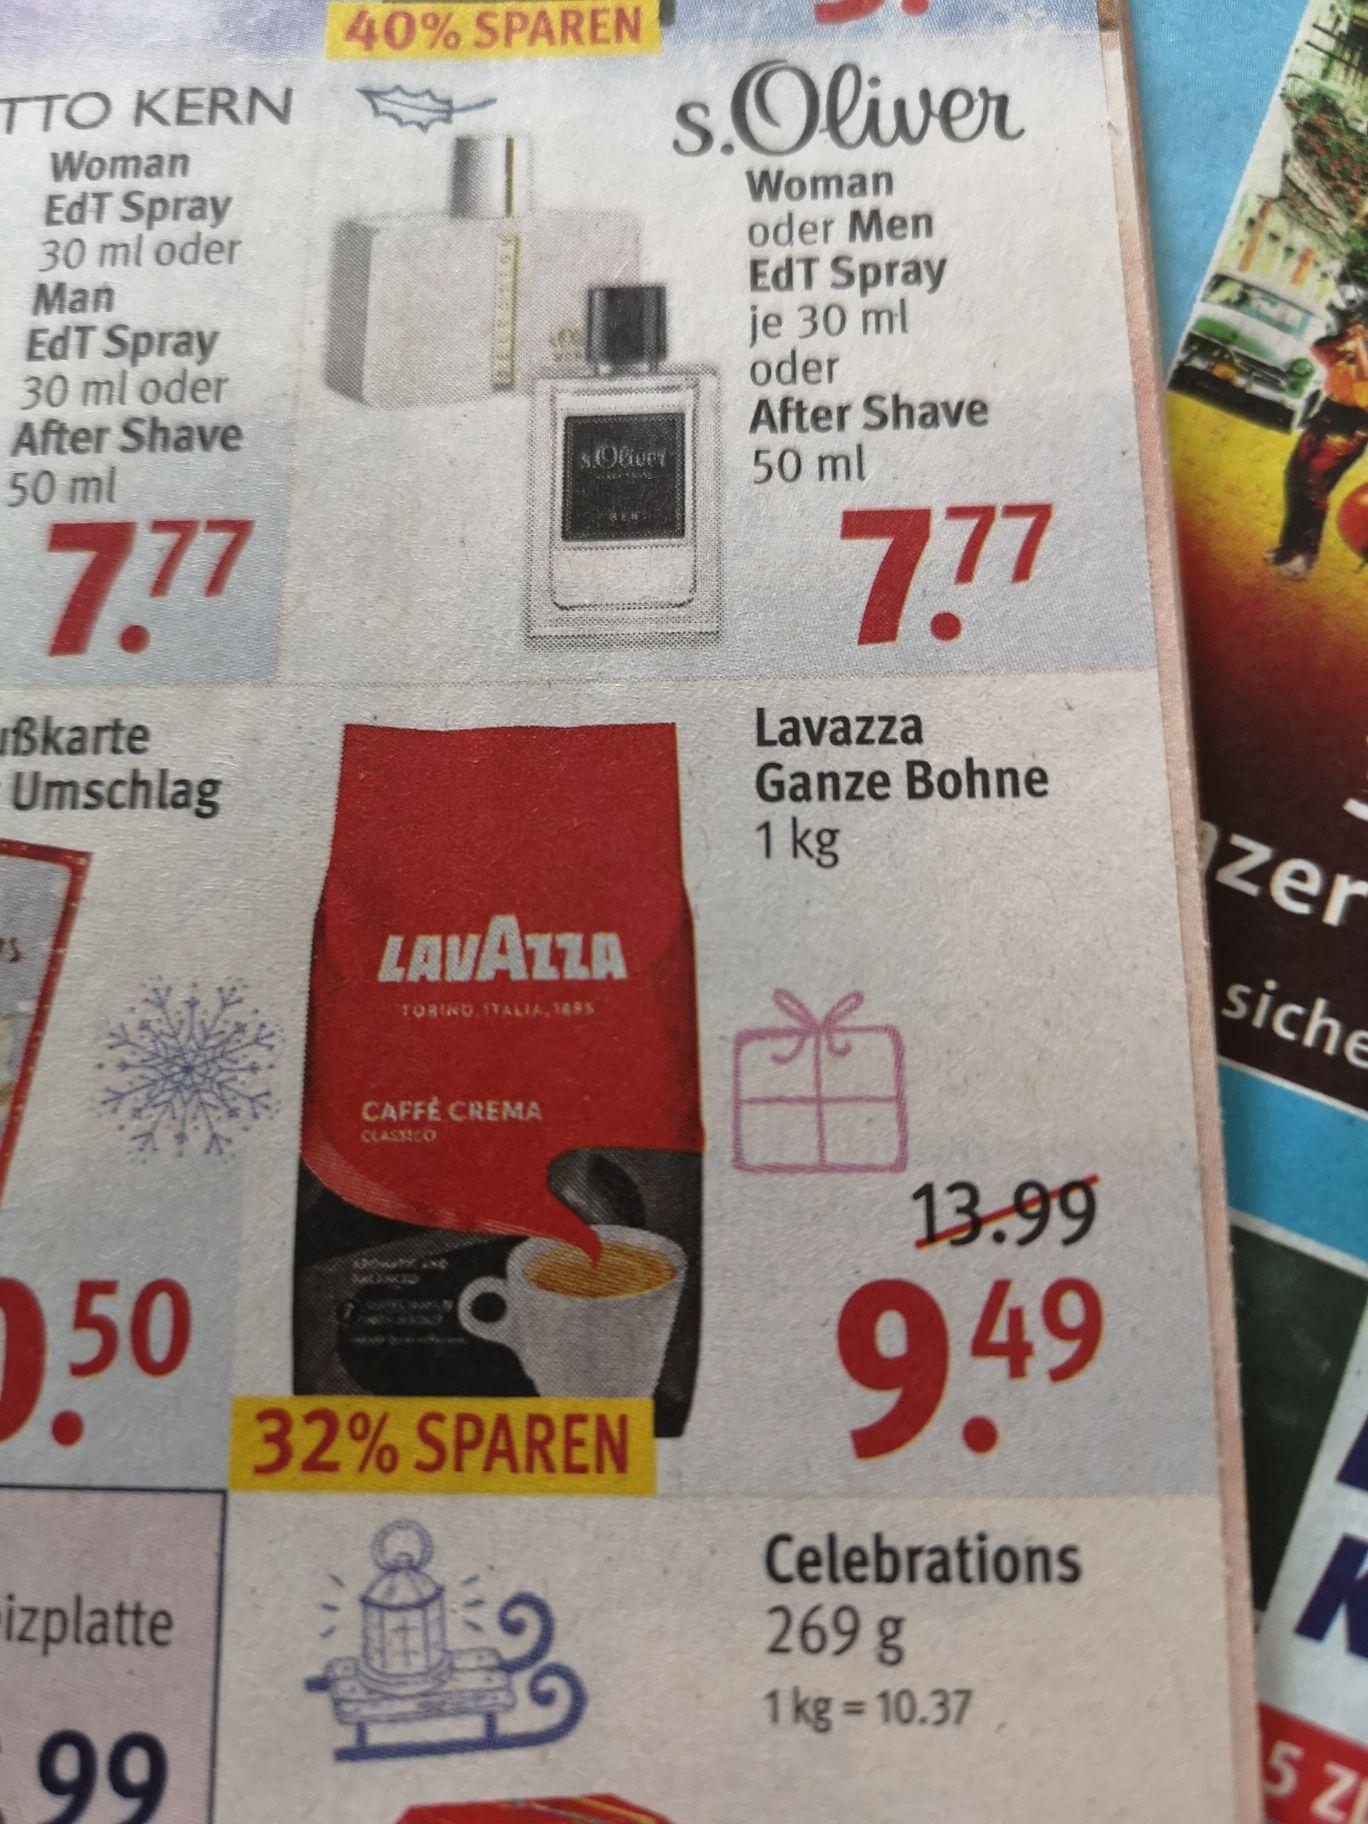 Lavazza Ganze Bohne Caffé Crema 1kg für 8.54€ bei Rossmann mit 10% Coupon